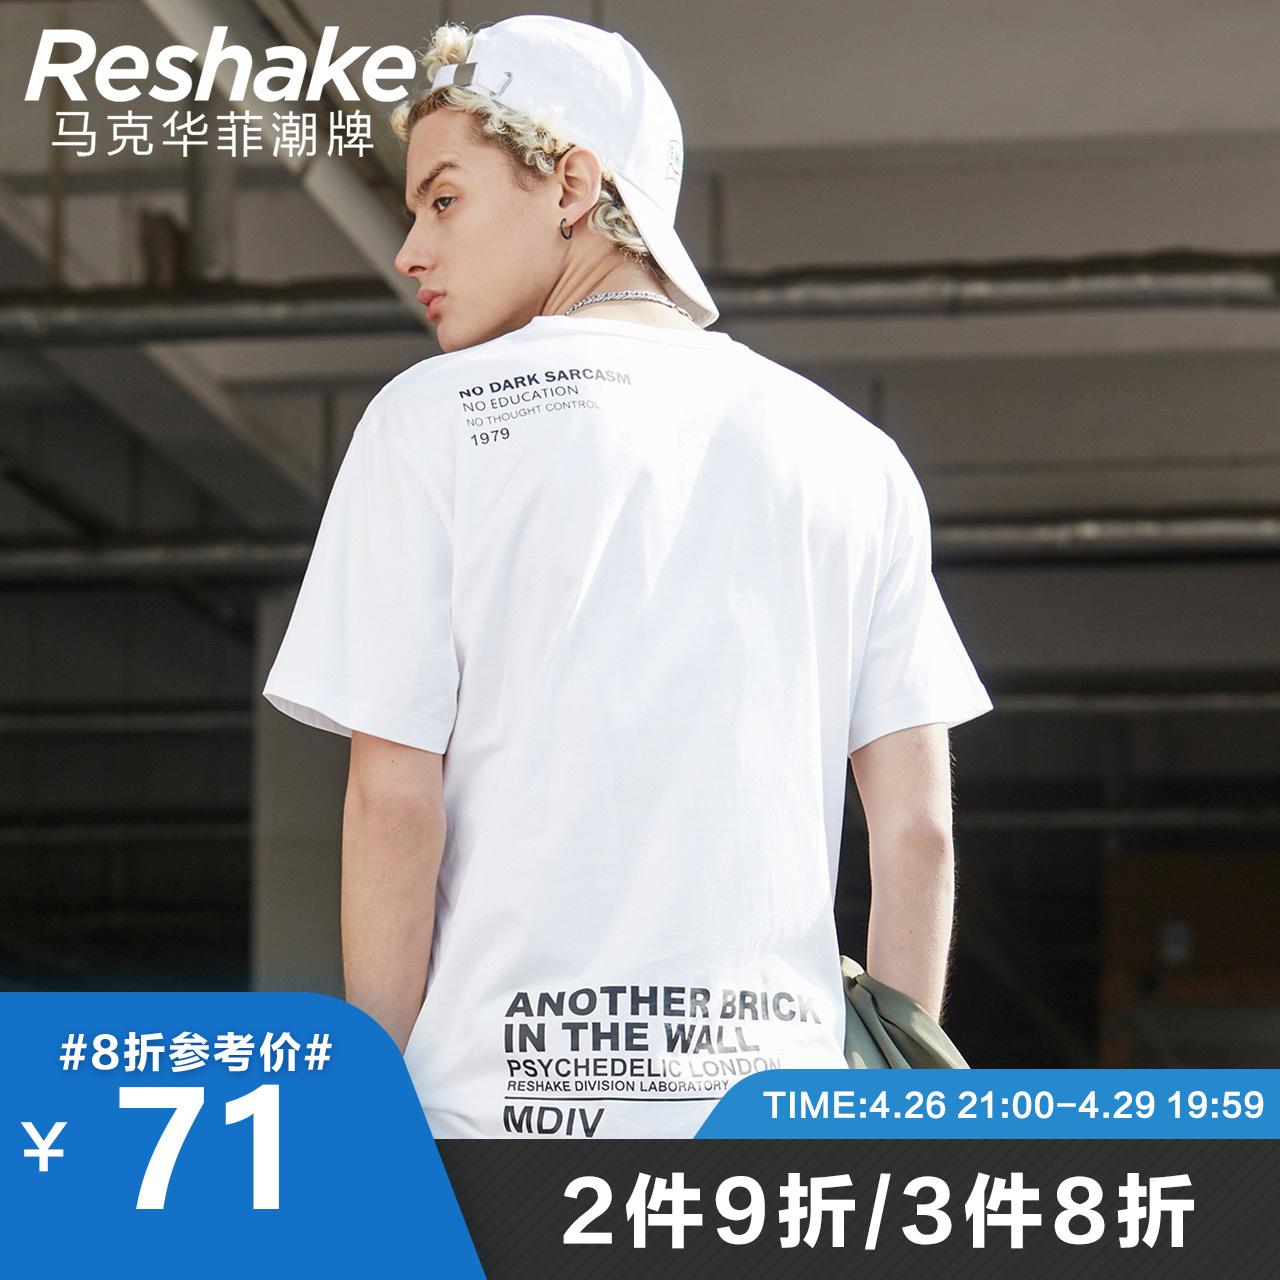 RESHAKE 后型格 318201027012 男士字母印花T恤 59元包邮